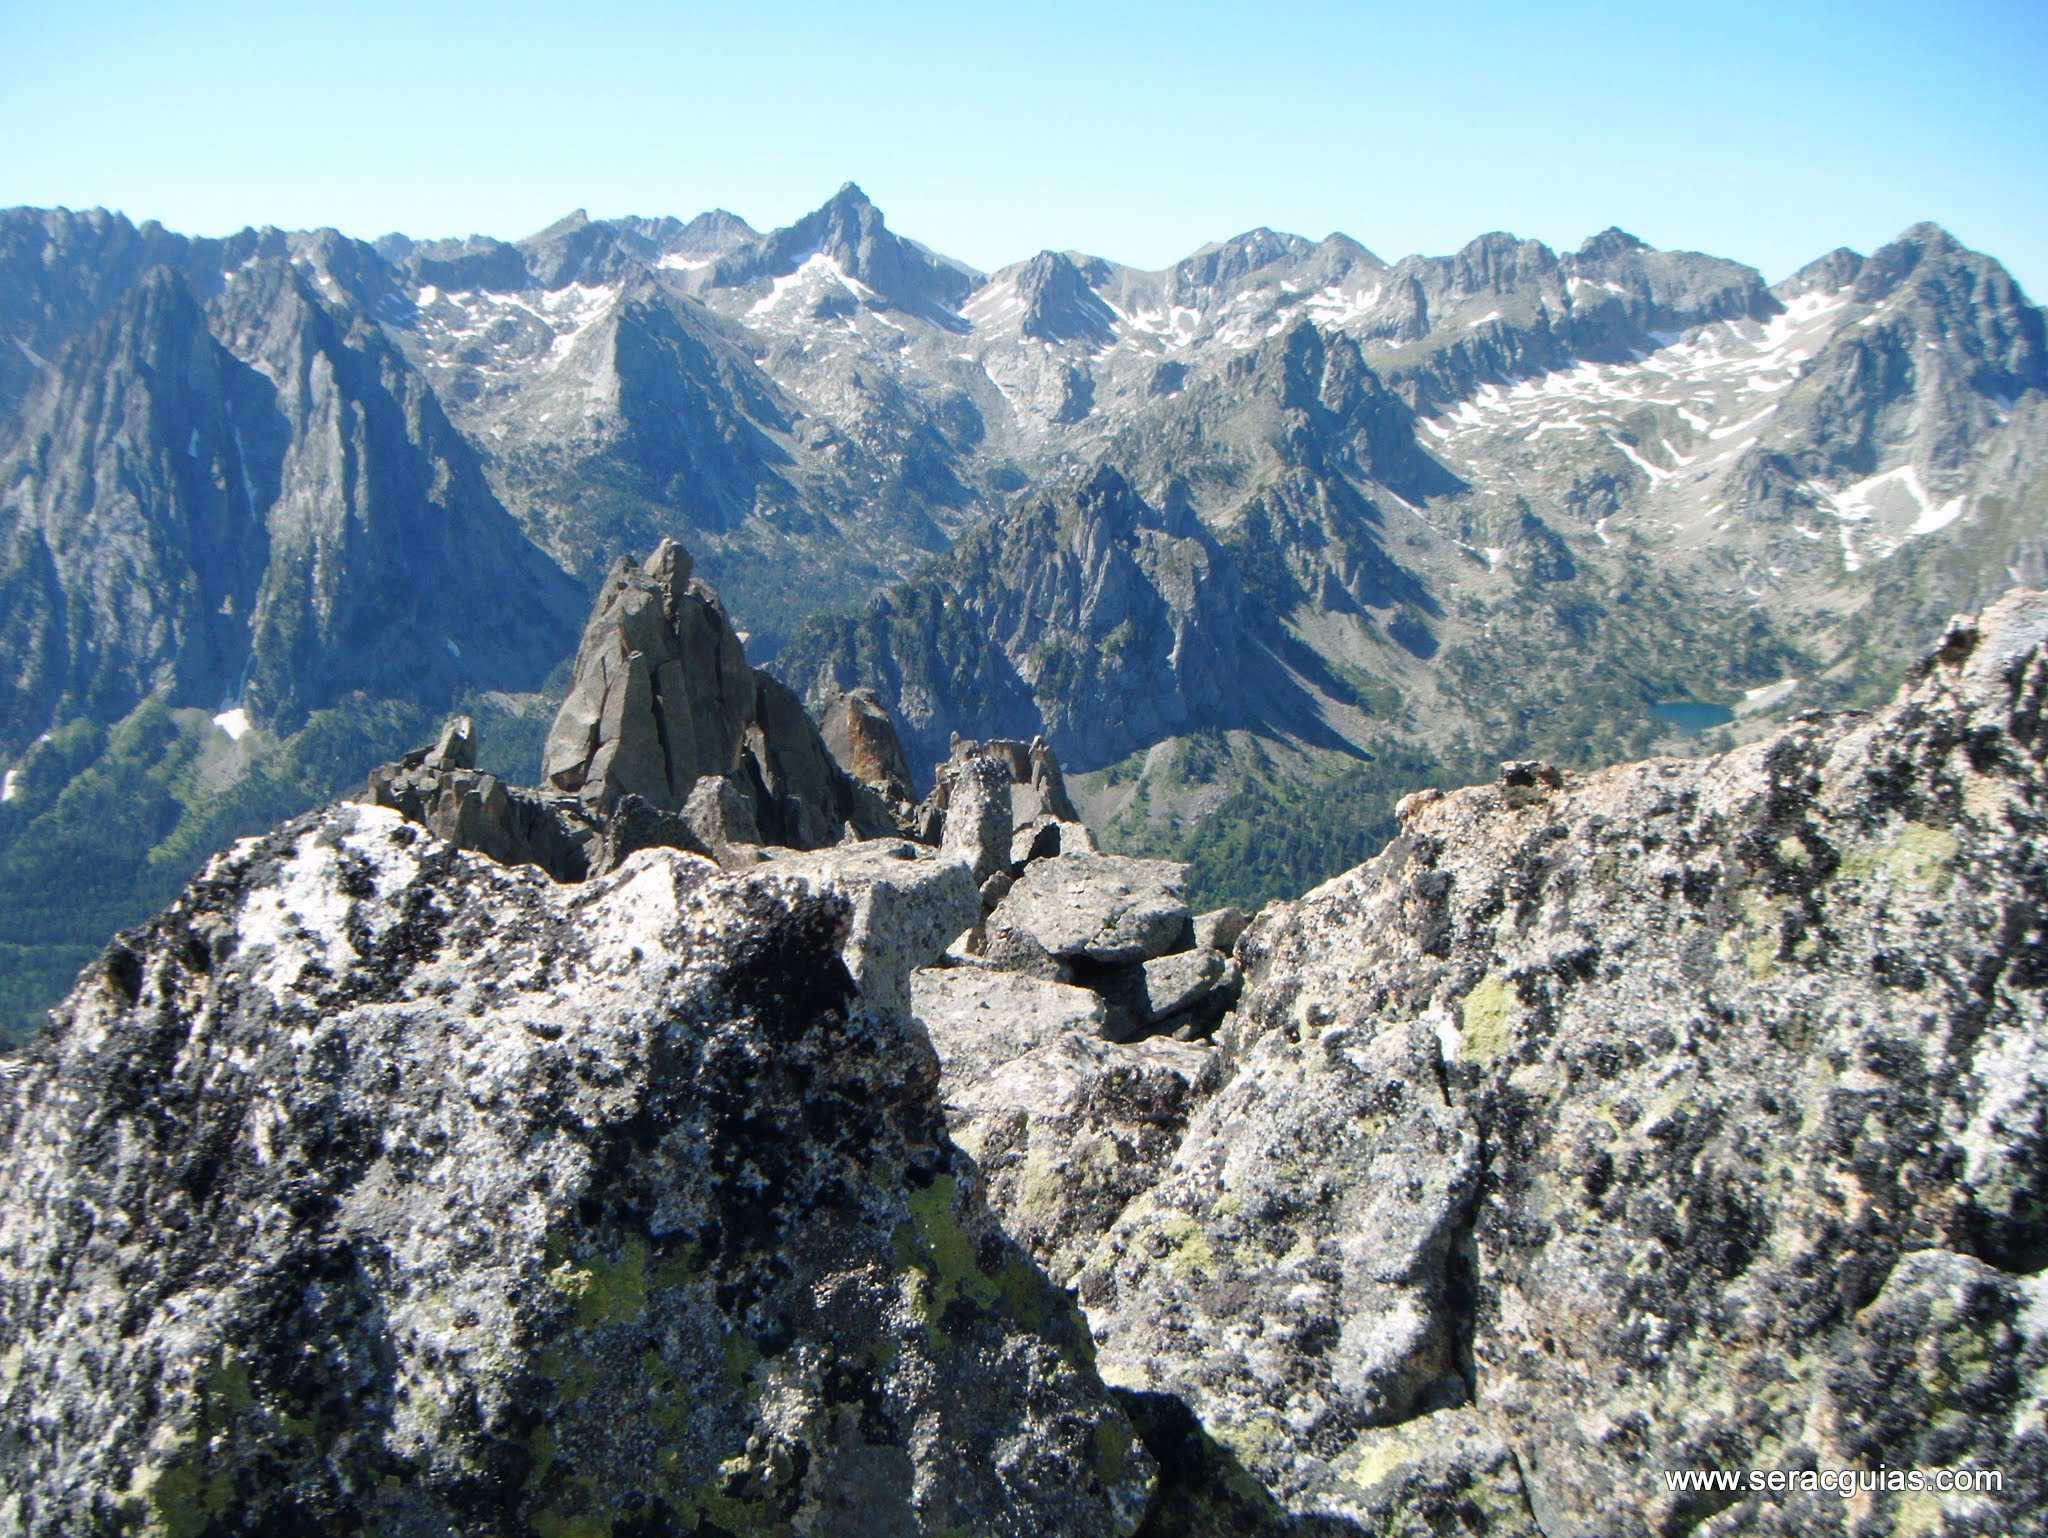 Cresta Basiero Amitges Pirineo 5 SERAC COMPAÑÍA DE GUÍAS